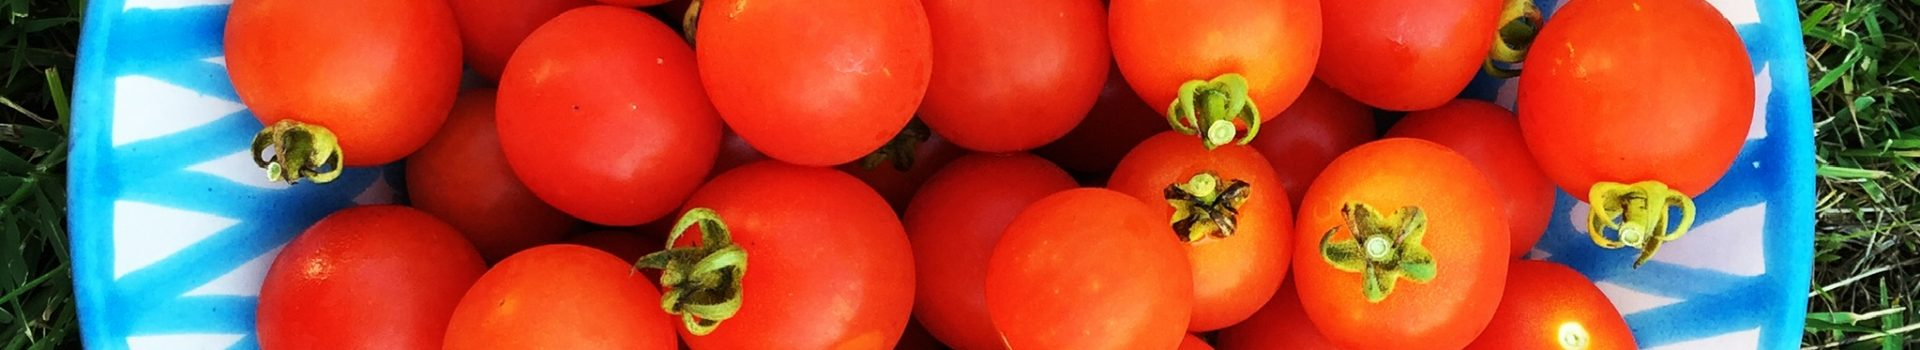 Healthy Eating: A Week of Meal-Prepping